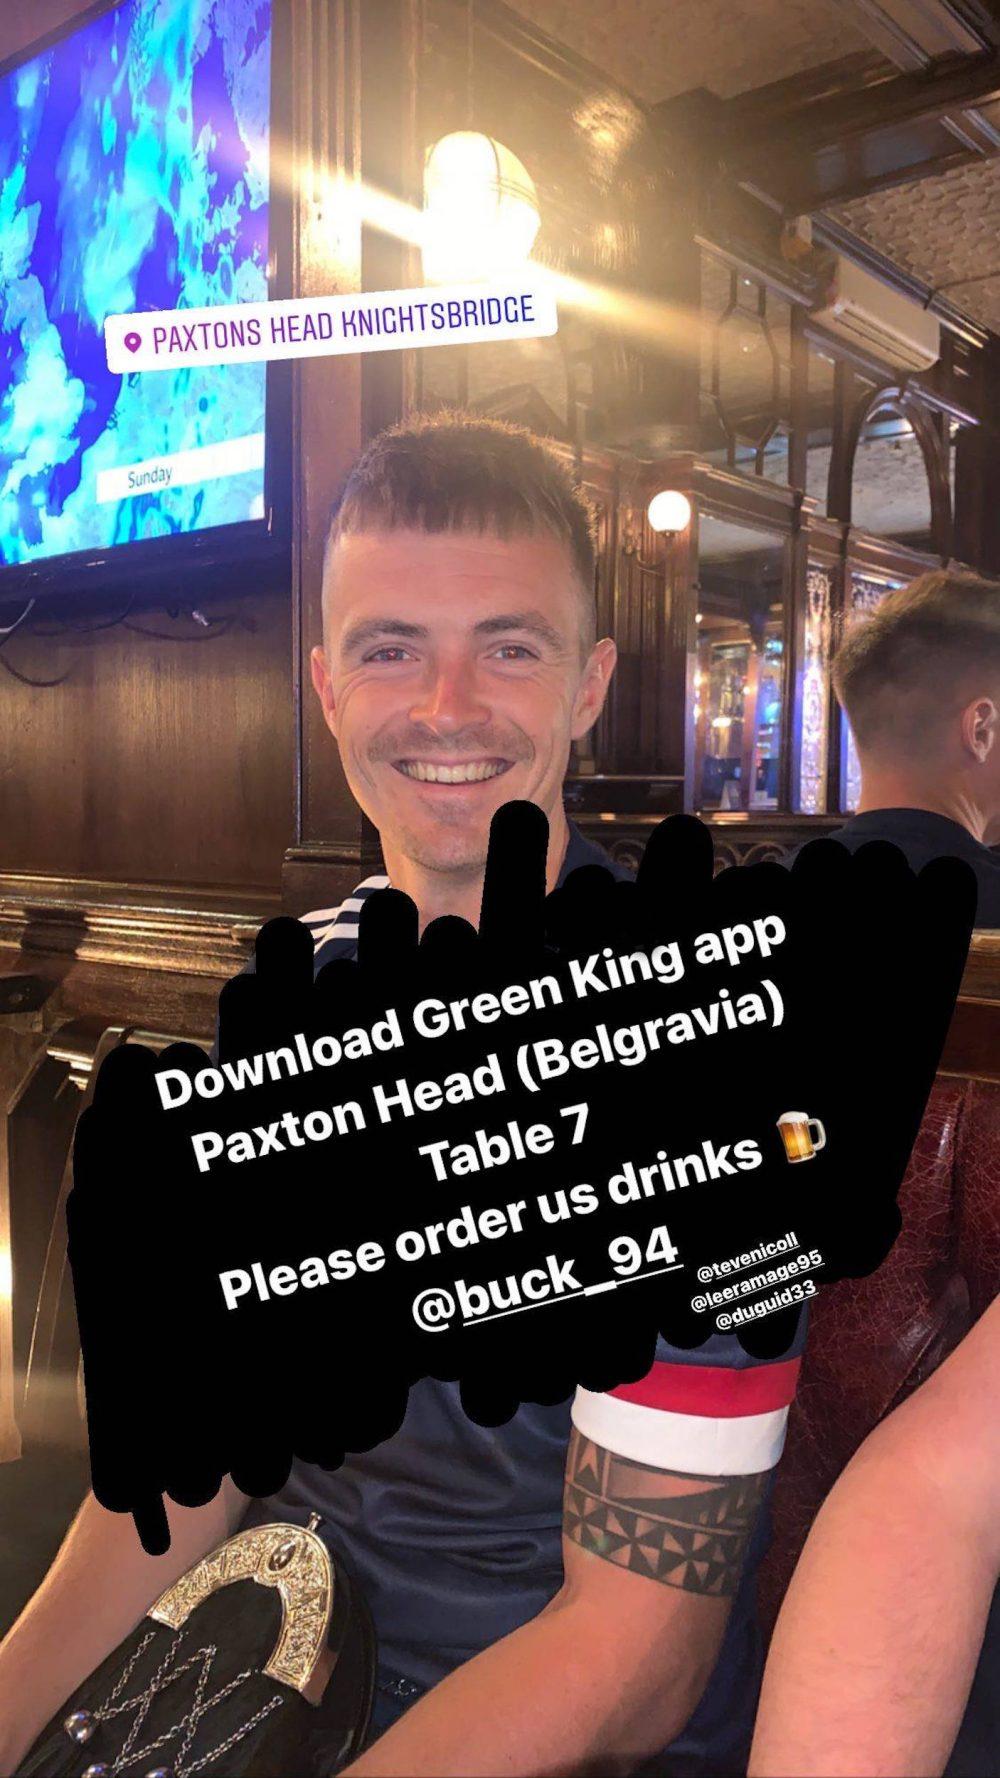 Ryan's social media plea for free drinks | Scottish News